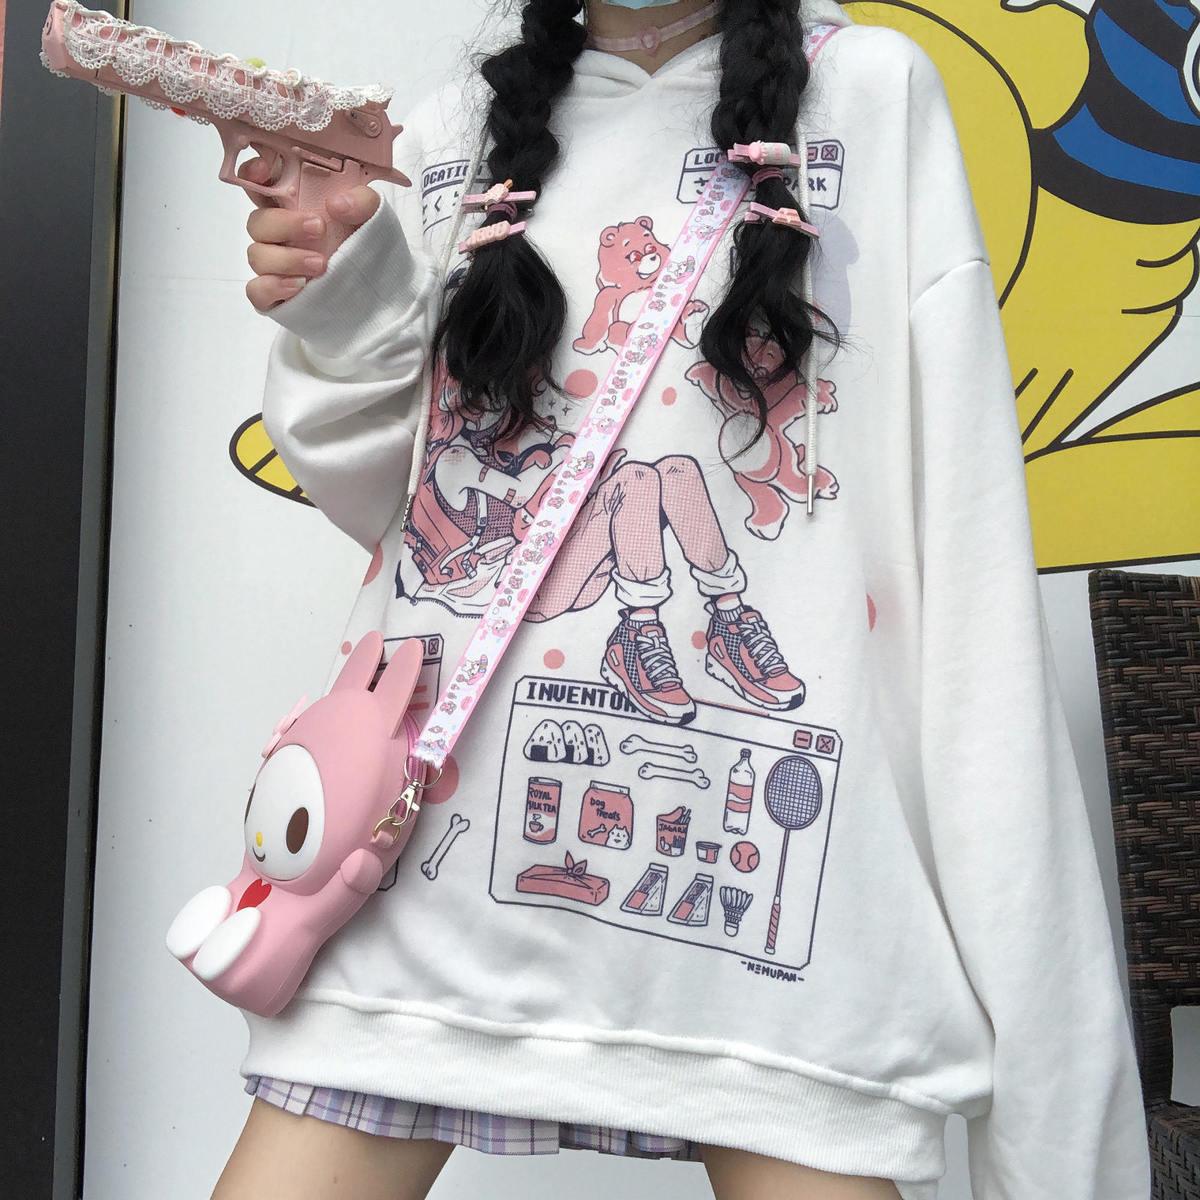 Kawaii Cartoon Anime Harajuku Hoodie Women Ulzzang Spring Japan Cute Sweatshirt Fashion Loose Casual Oversize Women'S Top Hoodie